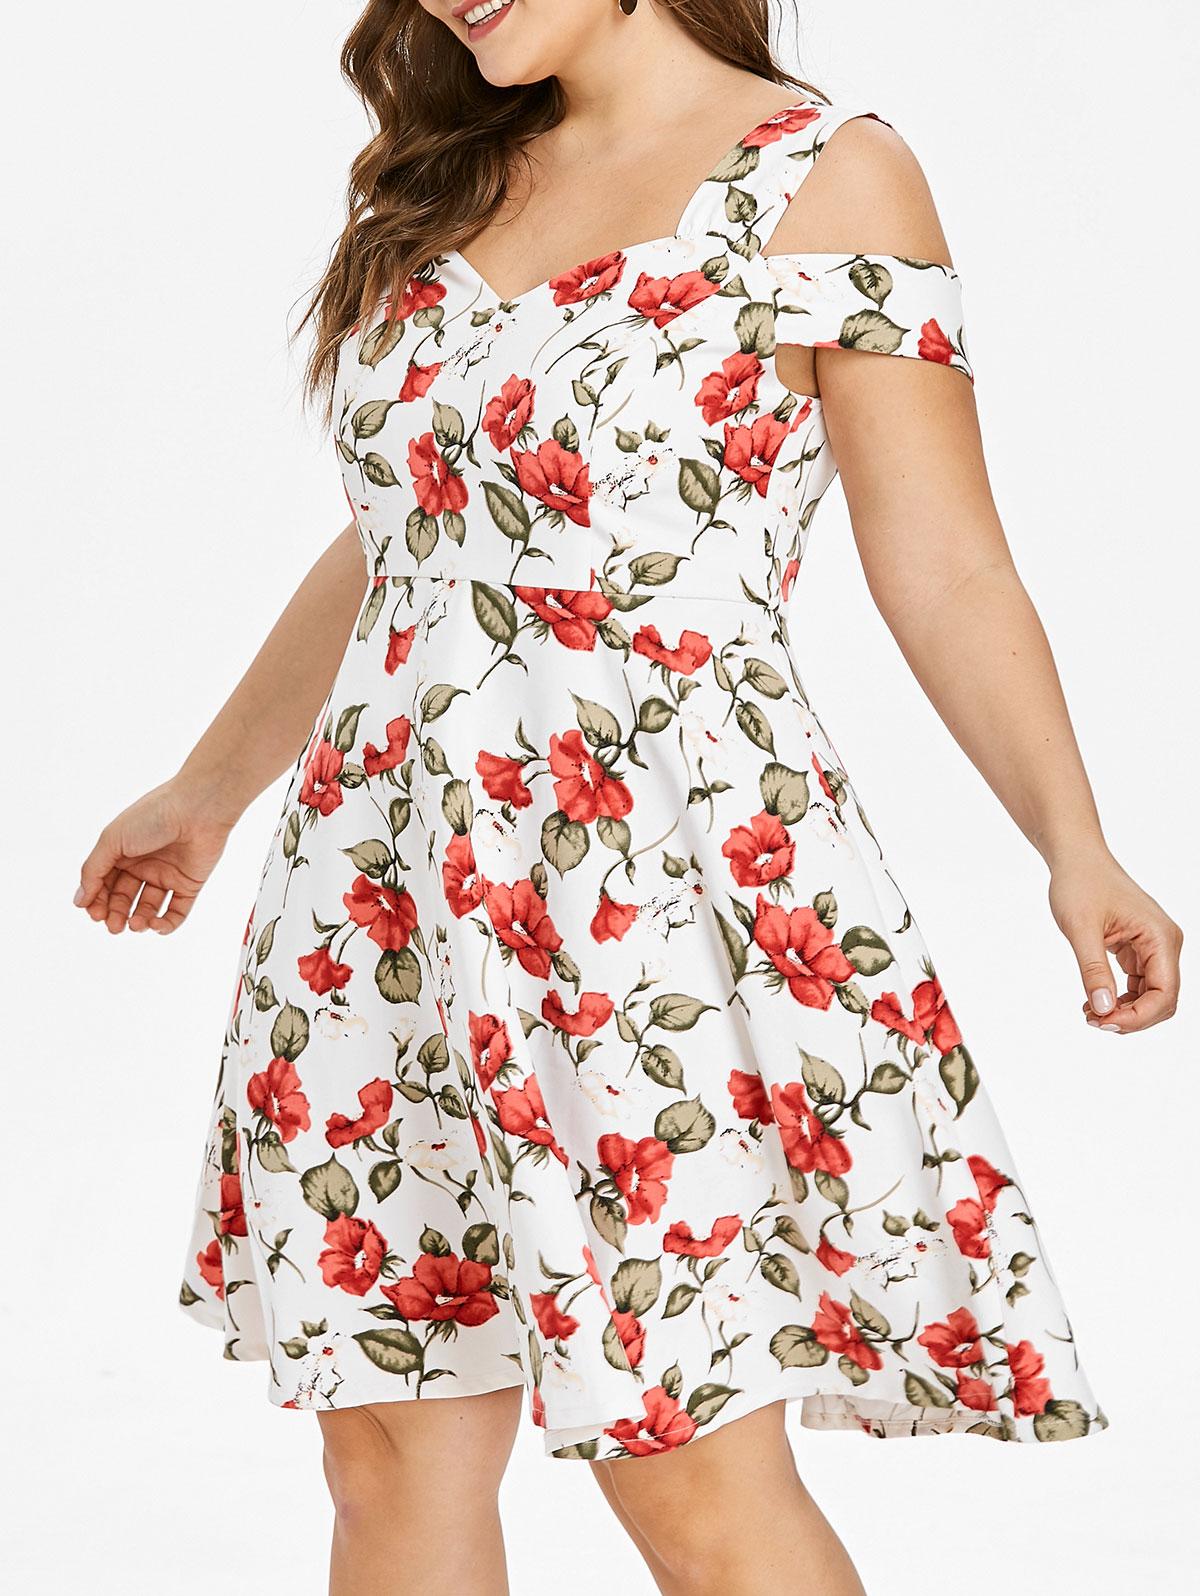 Retro Plus Size Floral Print Summer Dress Women Casual ...